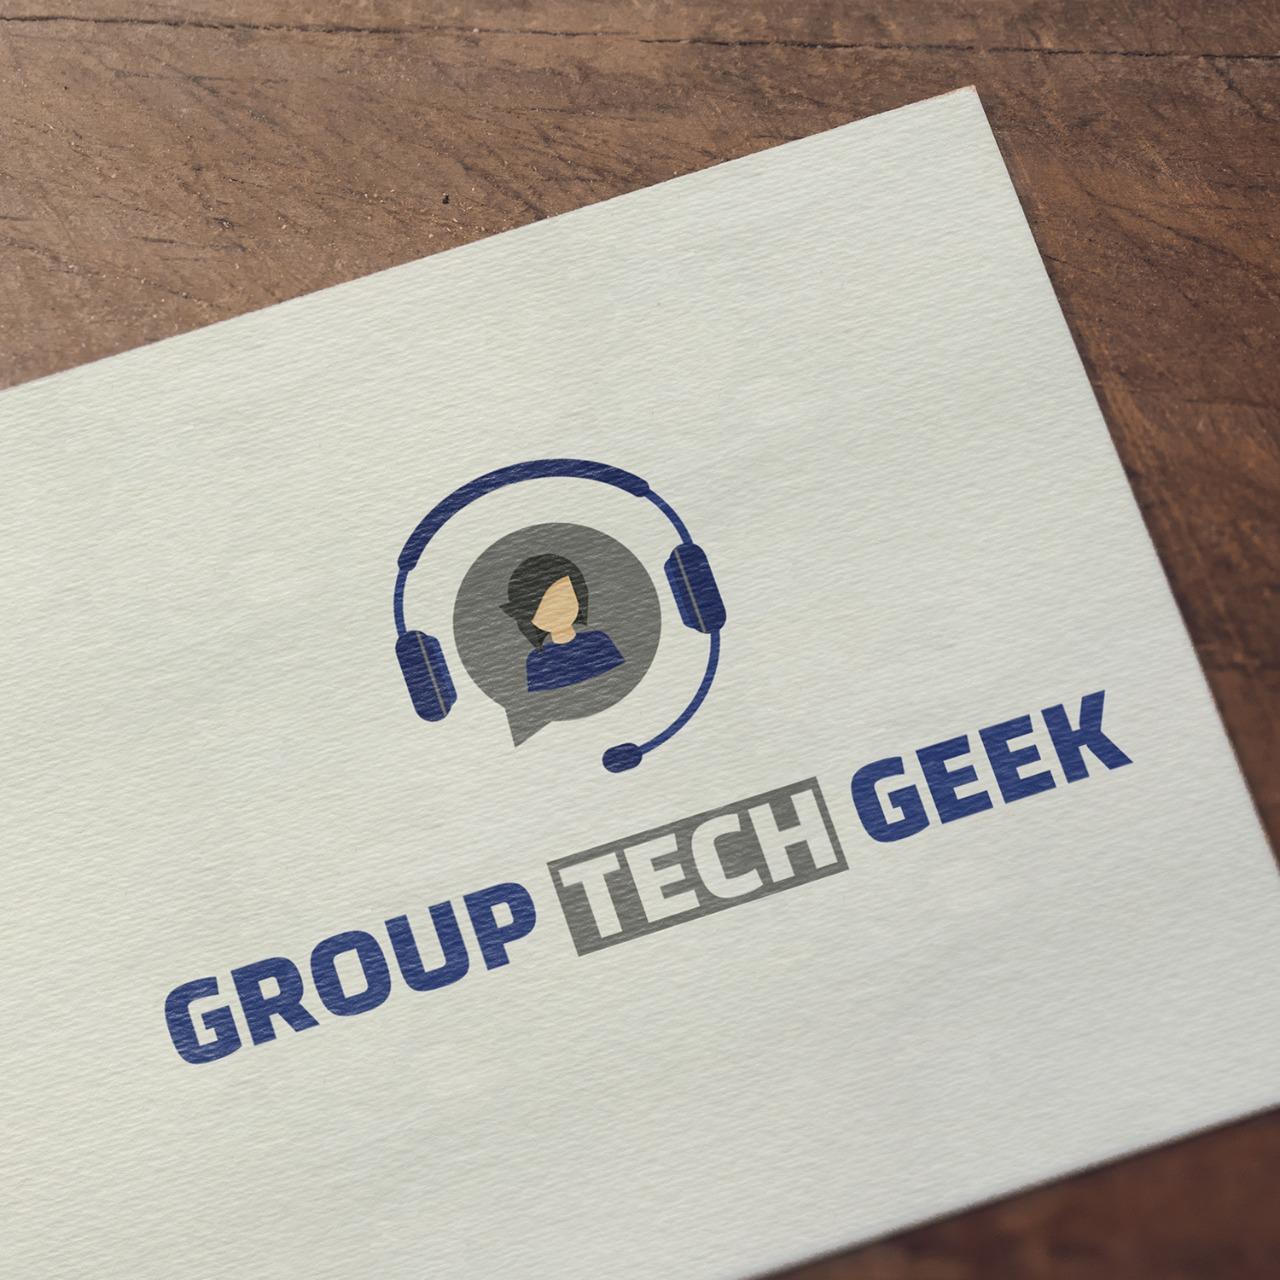 Logo Design for Group Tech Geek